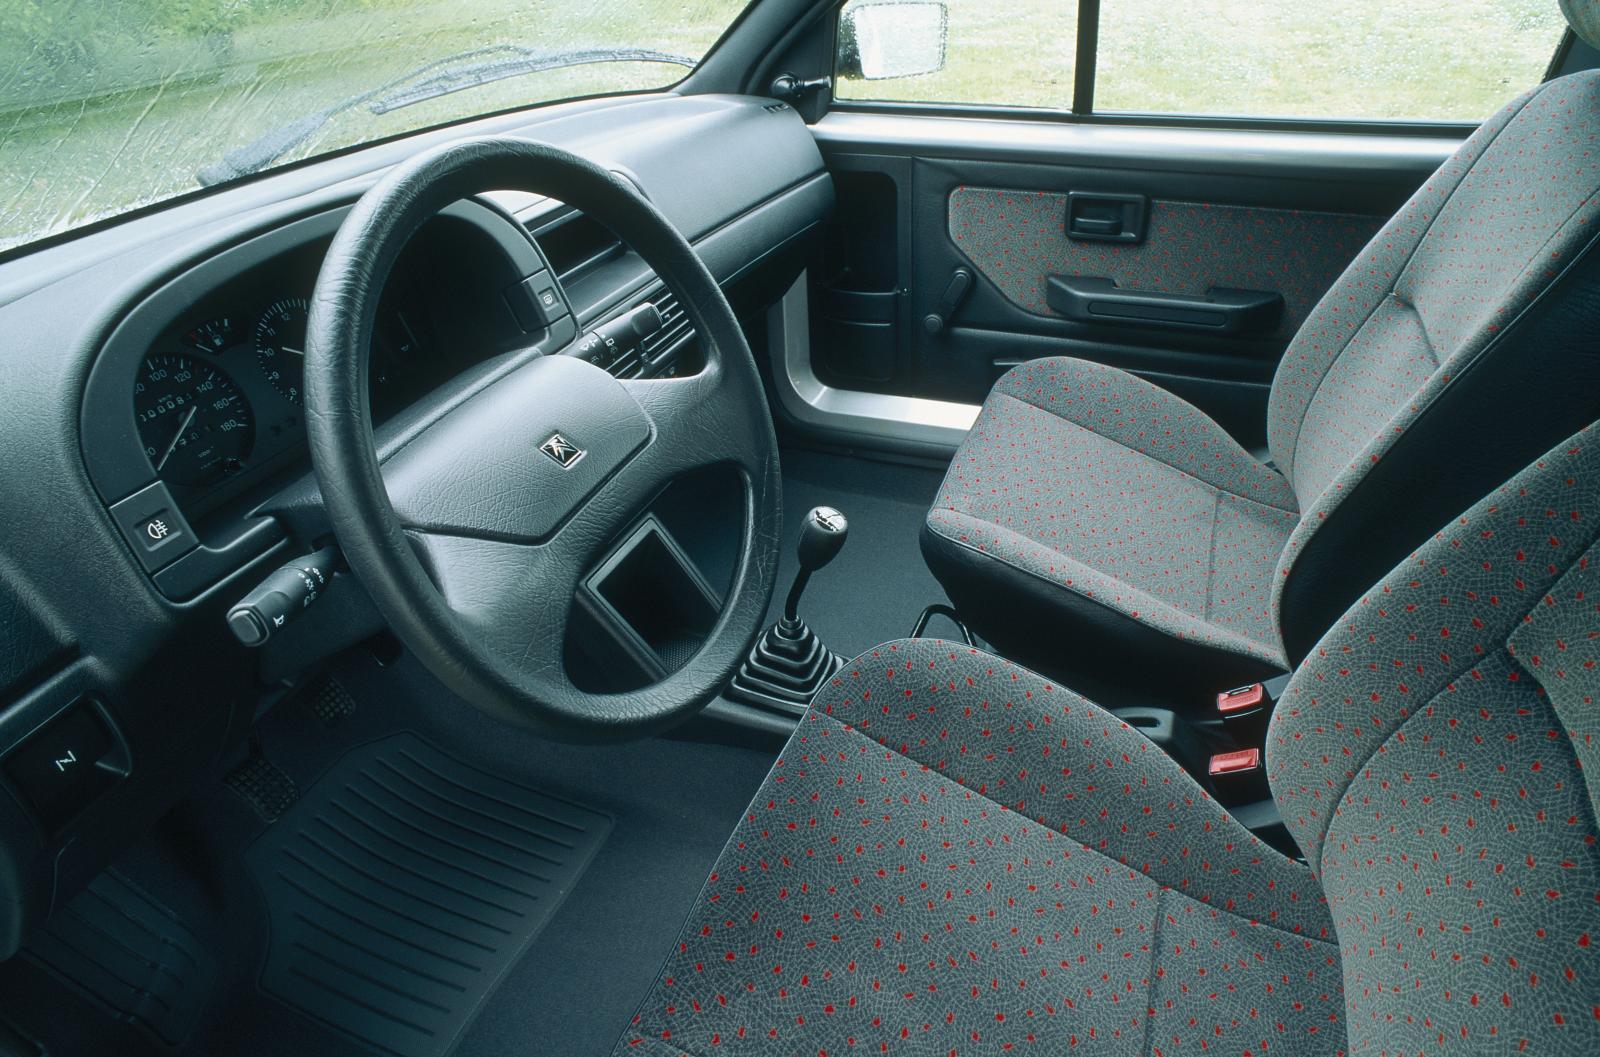 AX / 1991 (Remodelage)